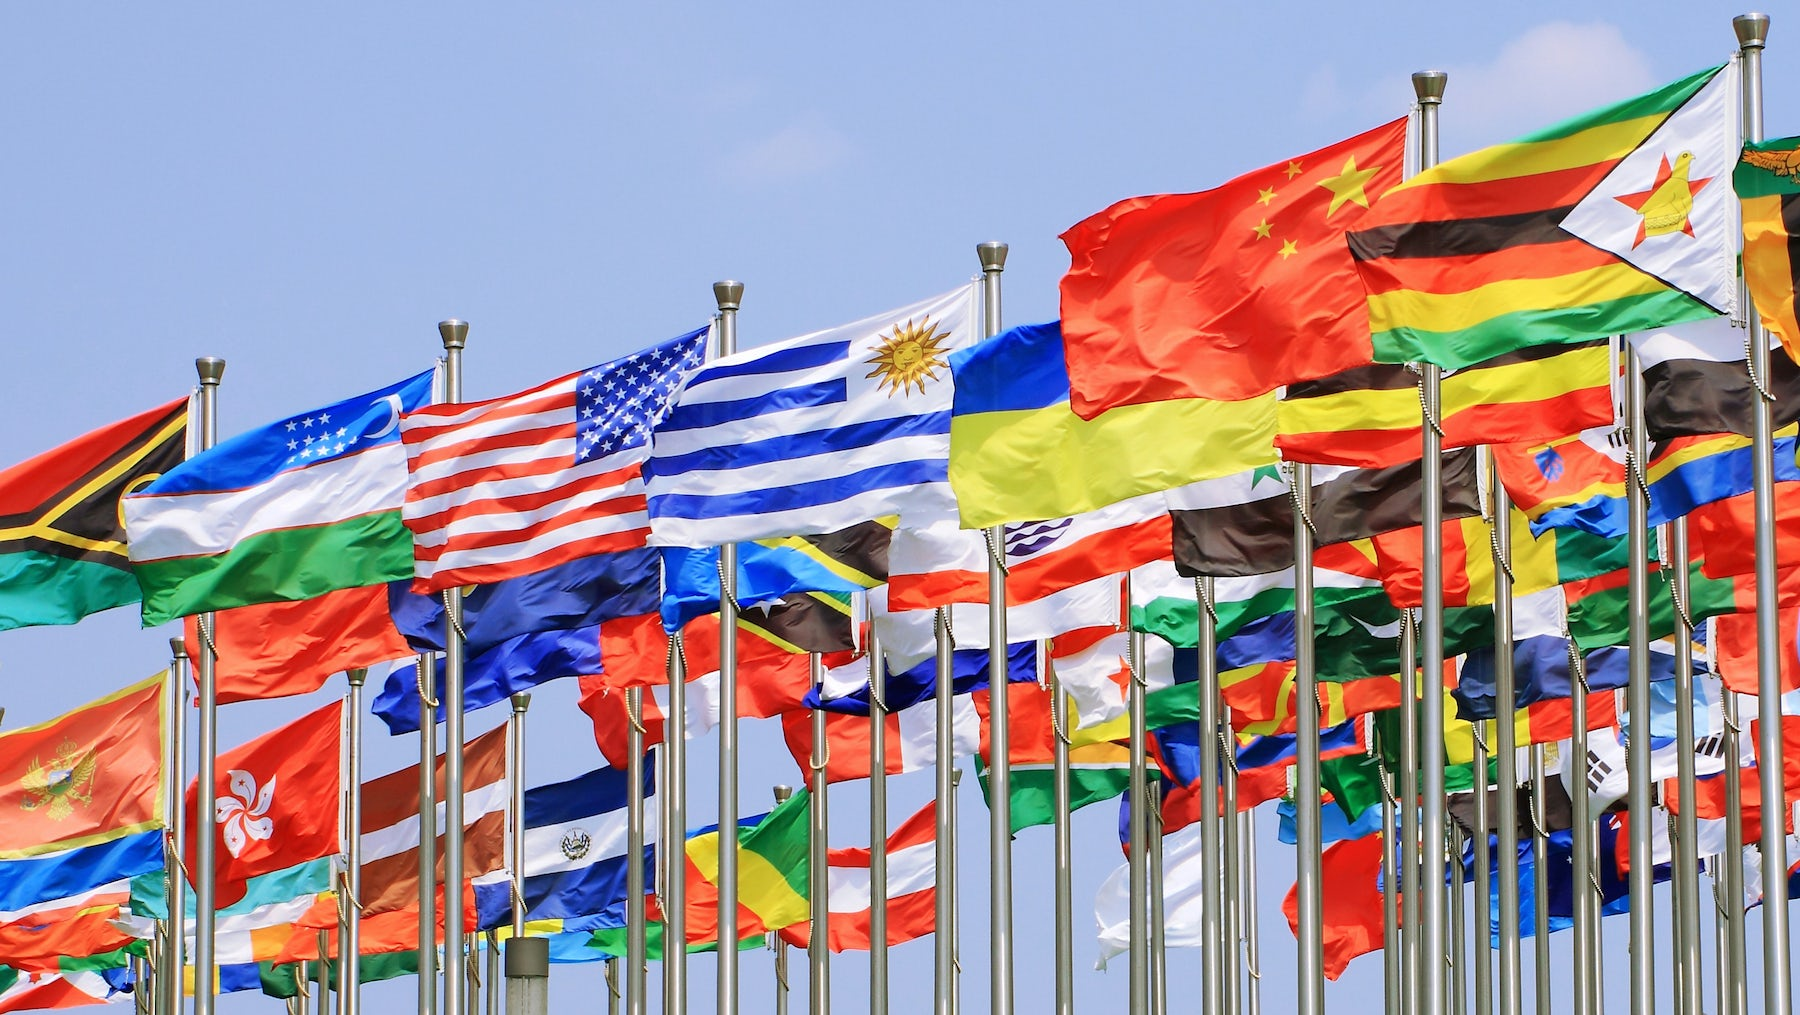 Flags | Source: Shutterstock